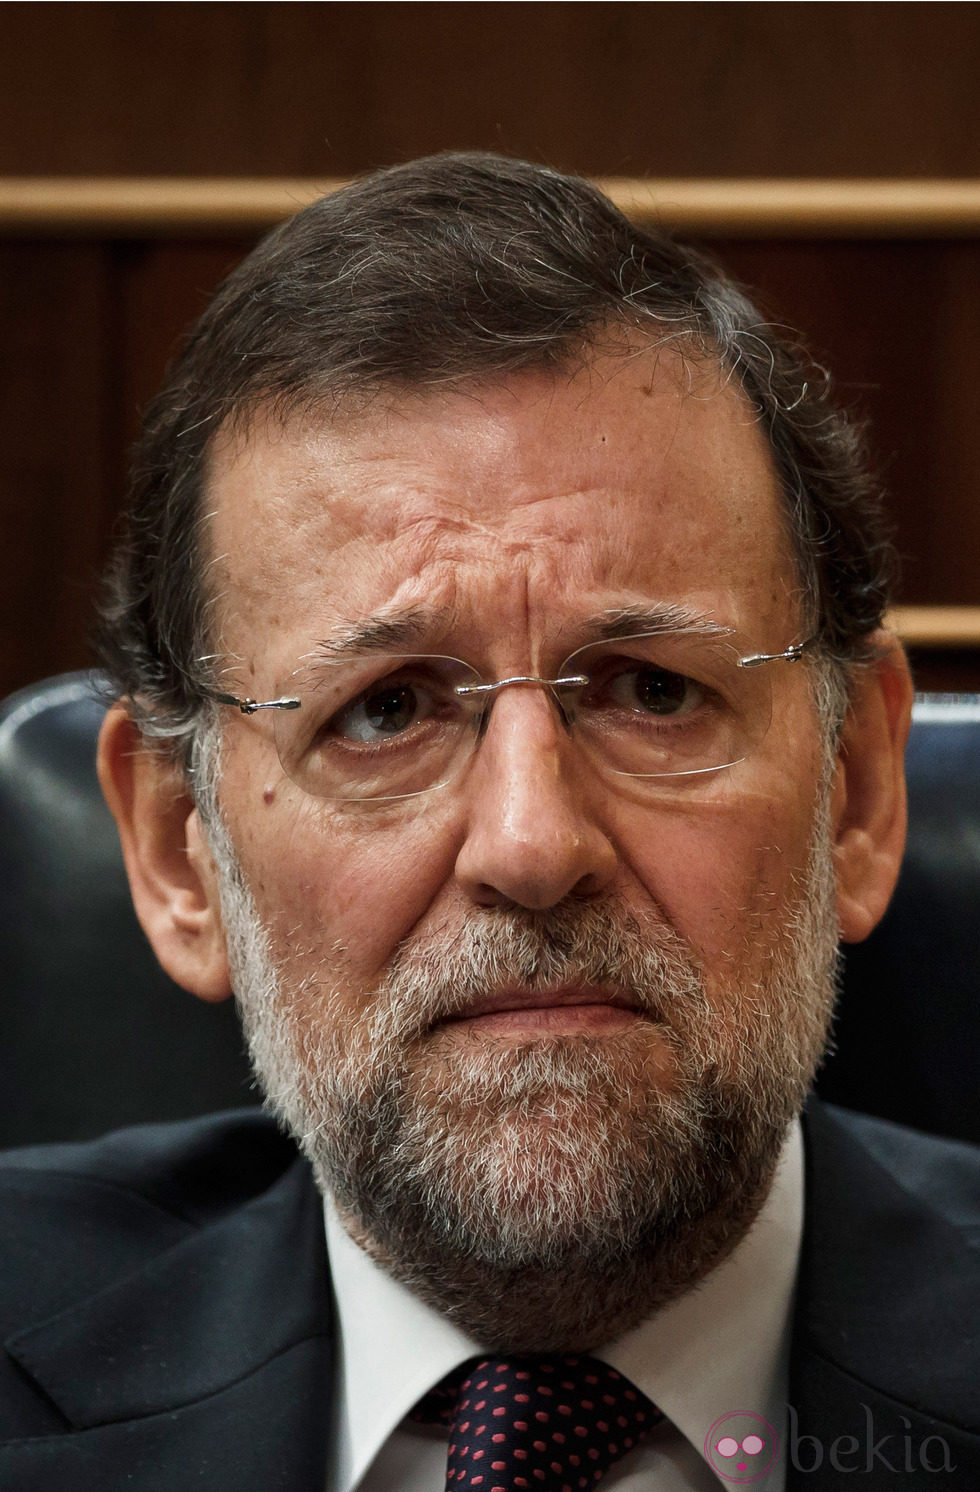 Mariano Rajoy triste